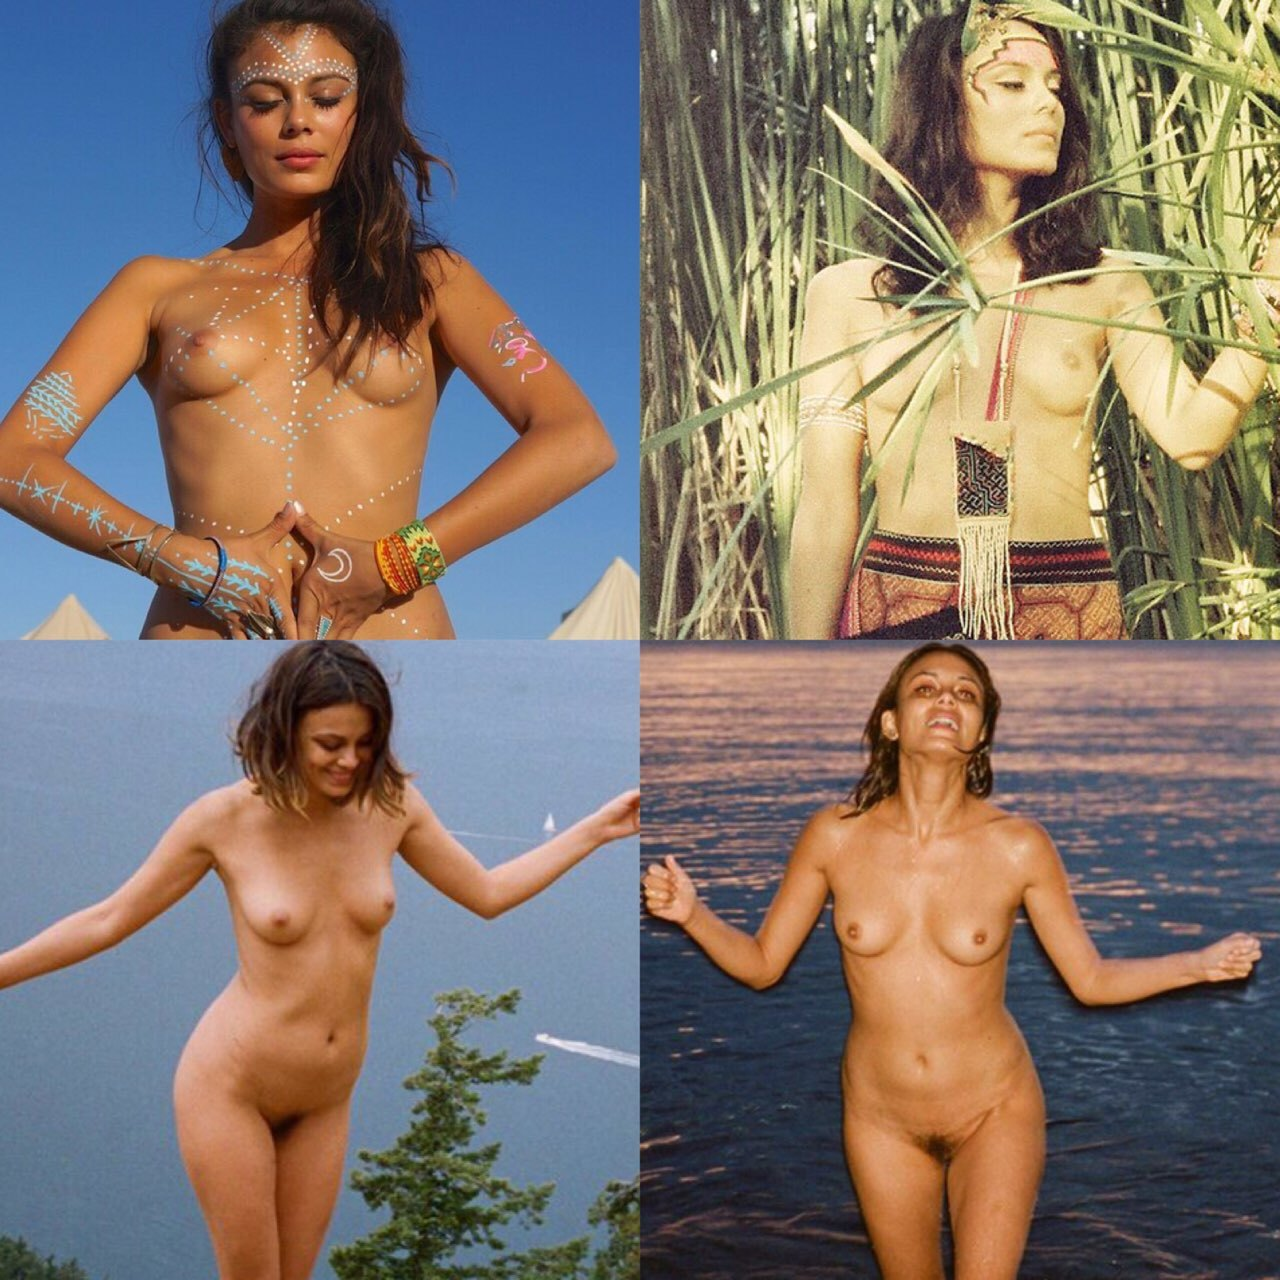 Nathalie kelley topless on the pool